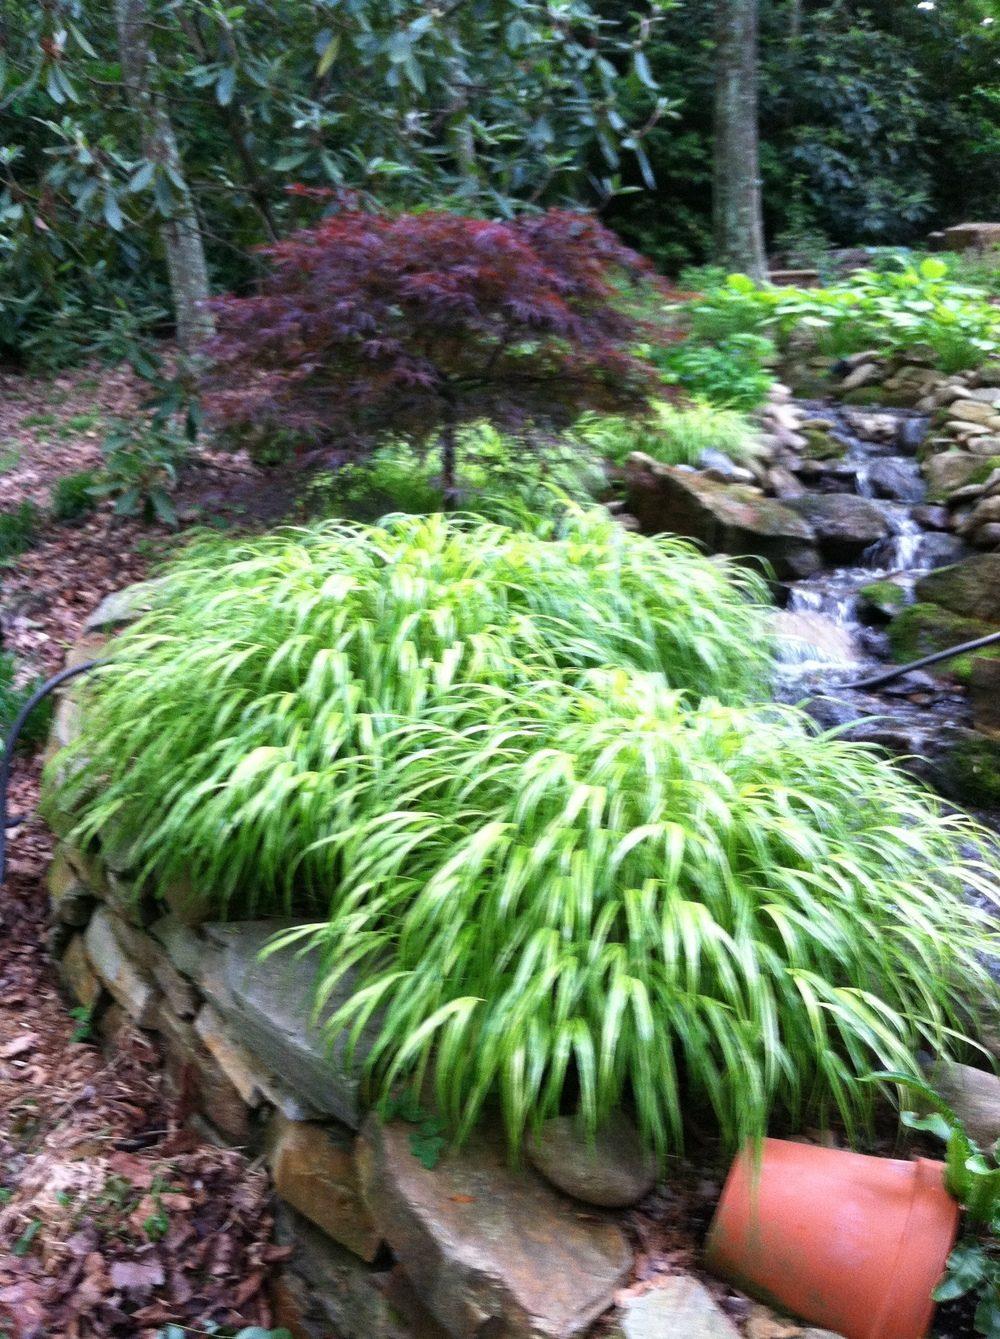 japaneseforestgrasswithjapanesemapleatchrisstonehouse-1421334